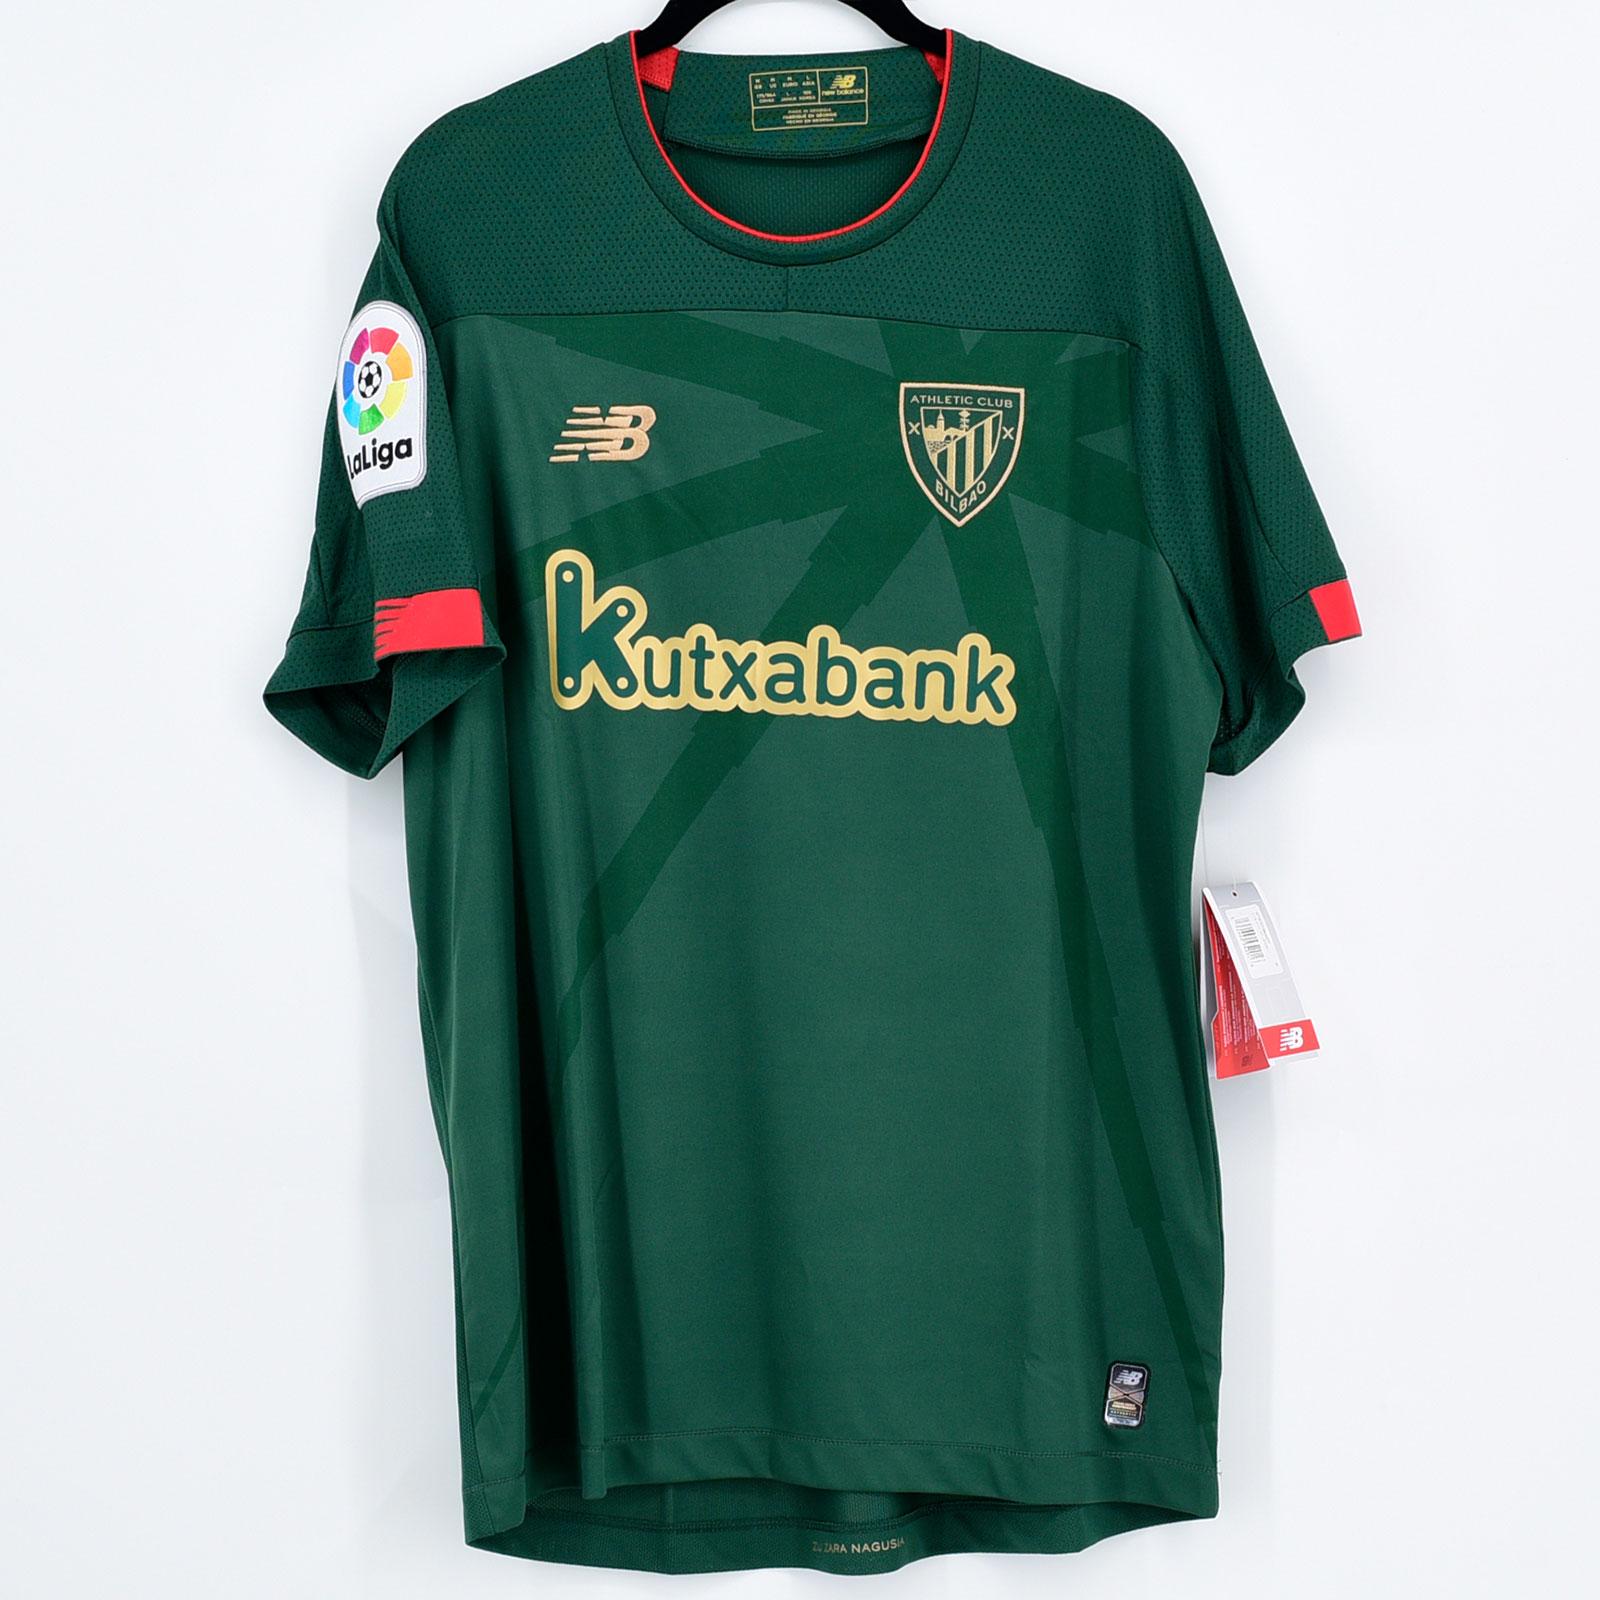 2019-20 Athletic Club Bilbao Away Shirt *BNWT* New Balance